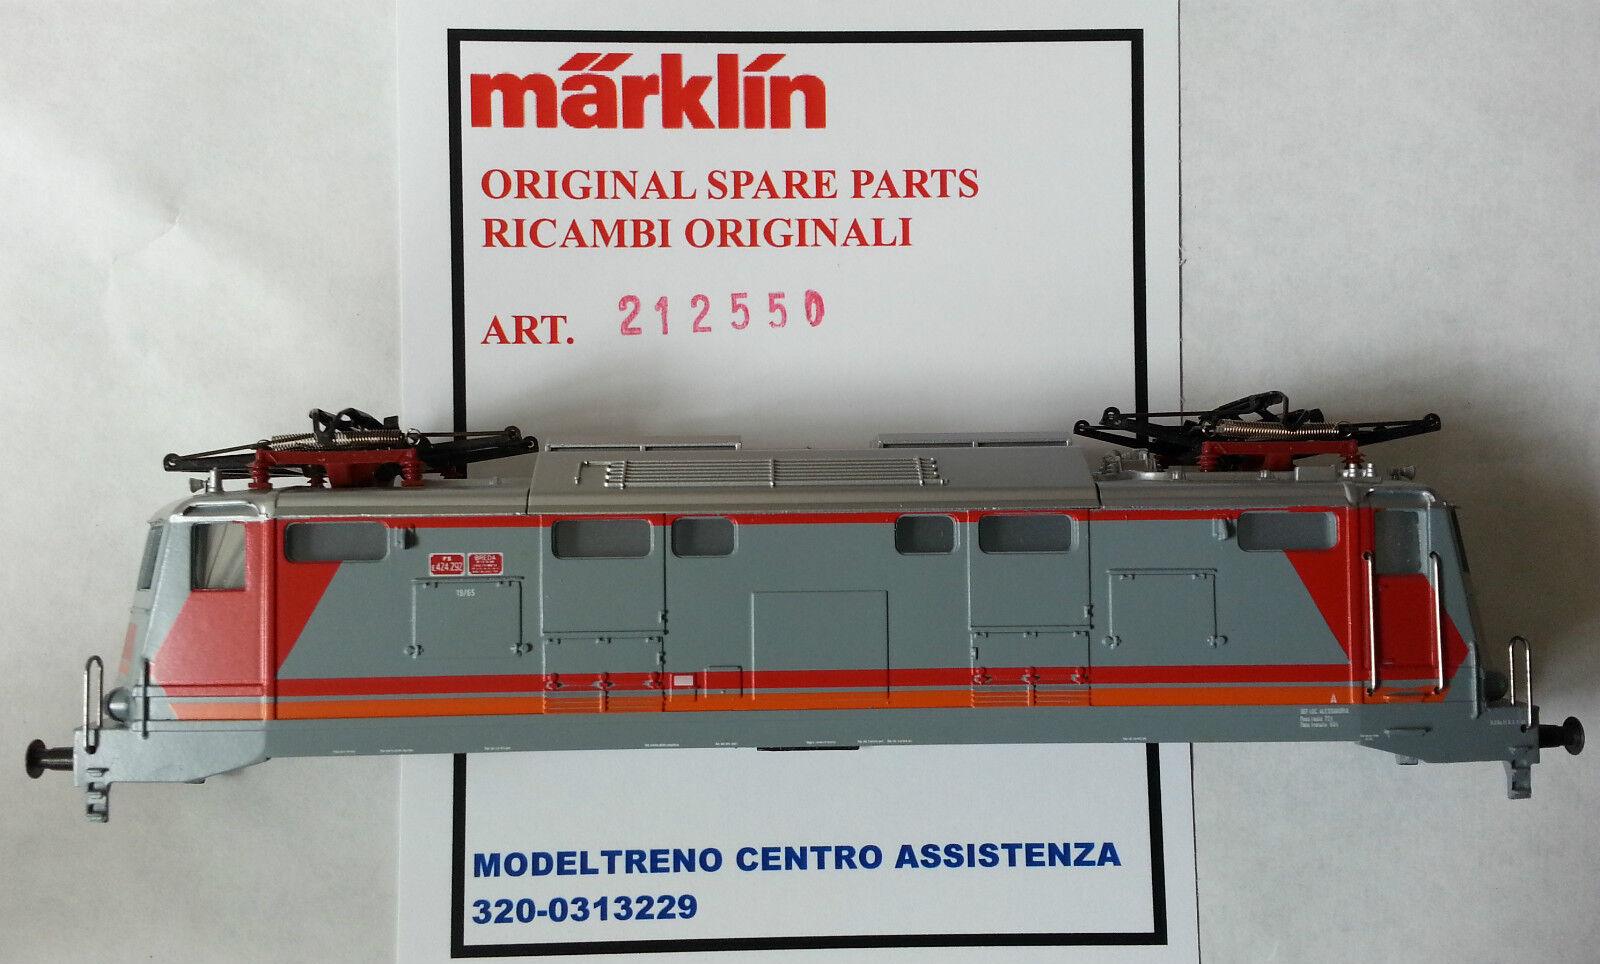 Marklin 21255 - 212550 Mantle Loco-lokaufbau 3162}